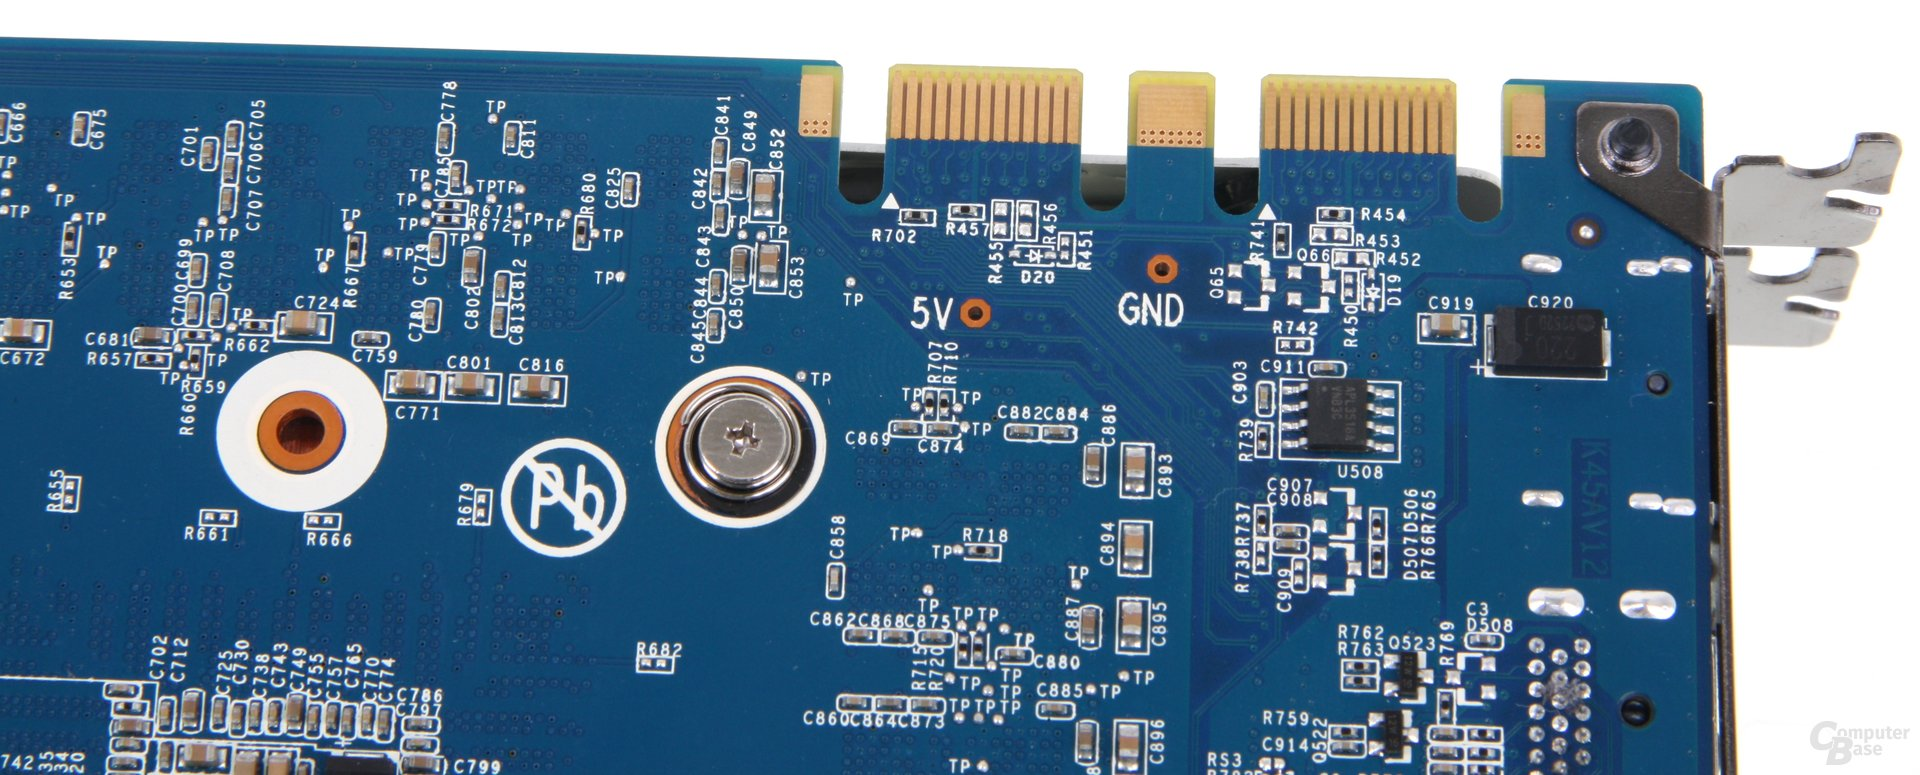 GeForce GTX 680 OC EX SLI-Anschlüsse